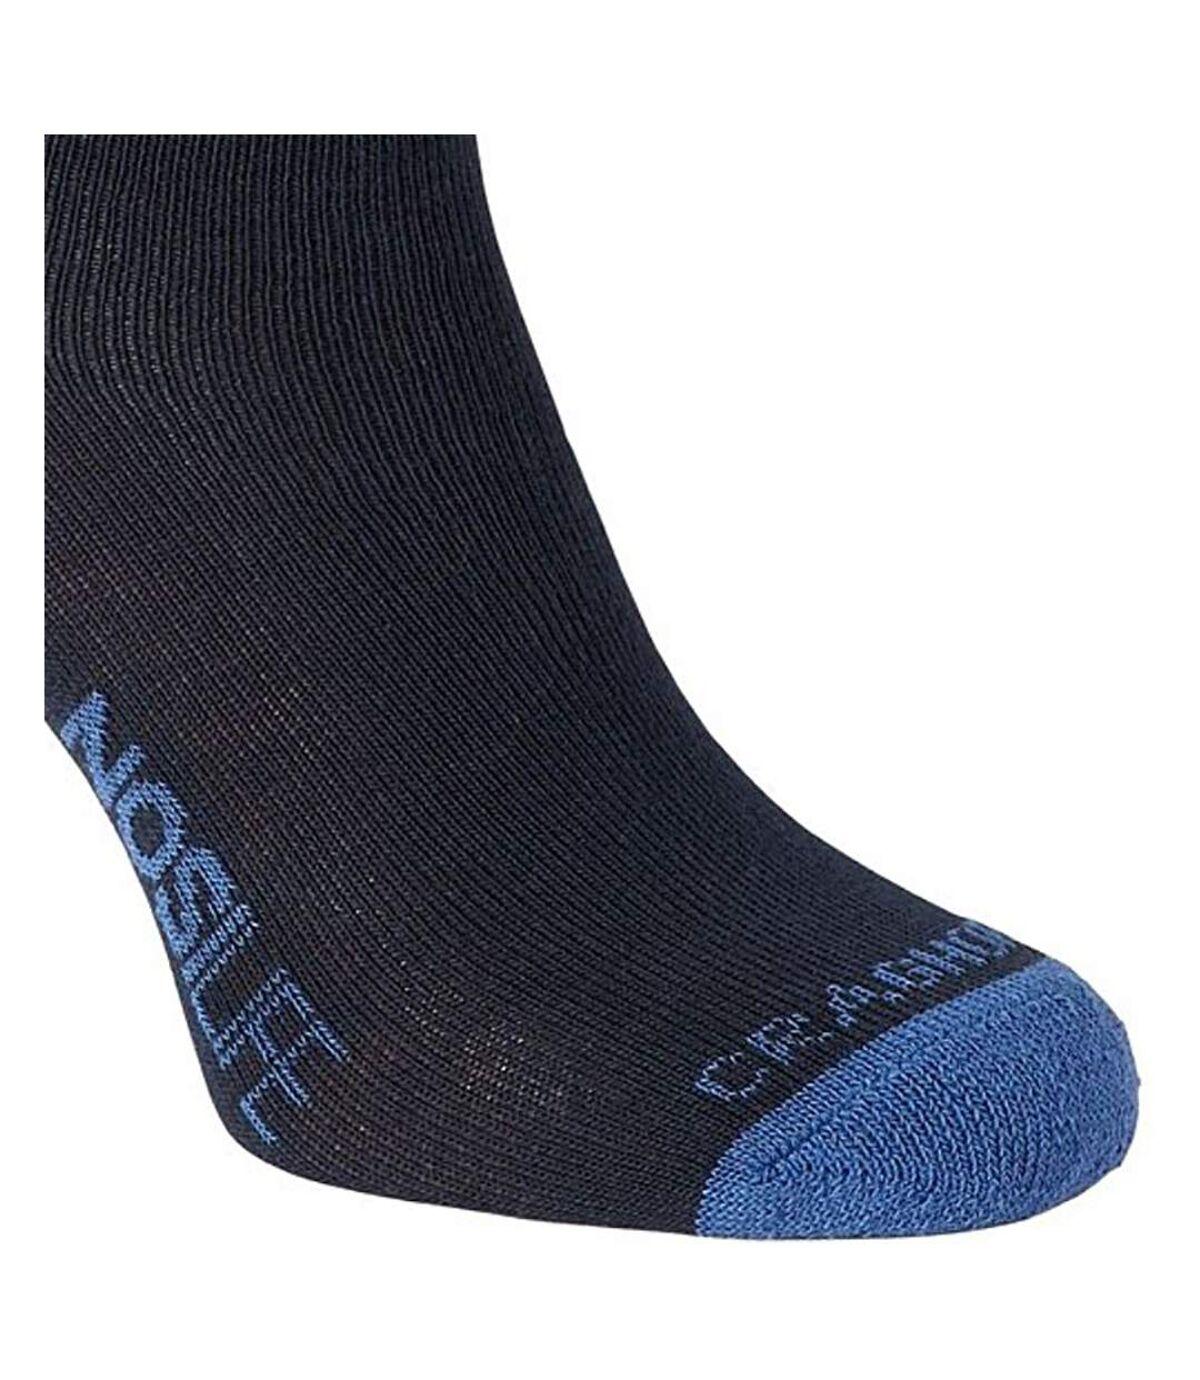 Craghoppers NosiLife Mens Insect Repellent Travel Socks (Dark Navy/Soft Denim) - UTCG289